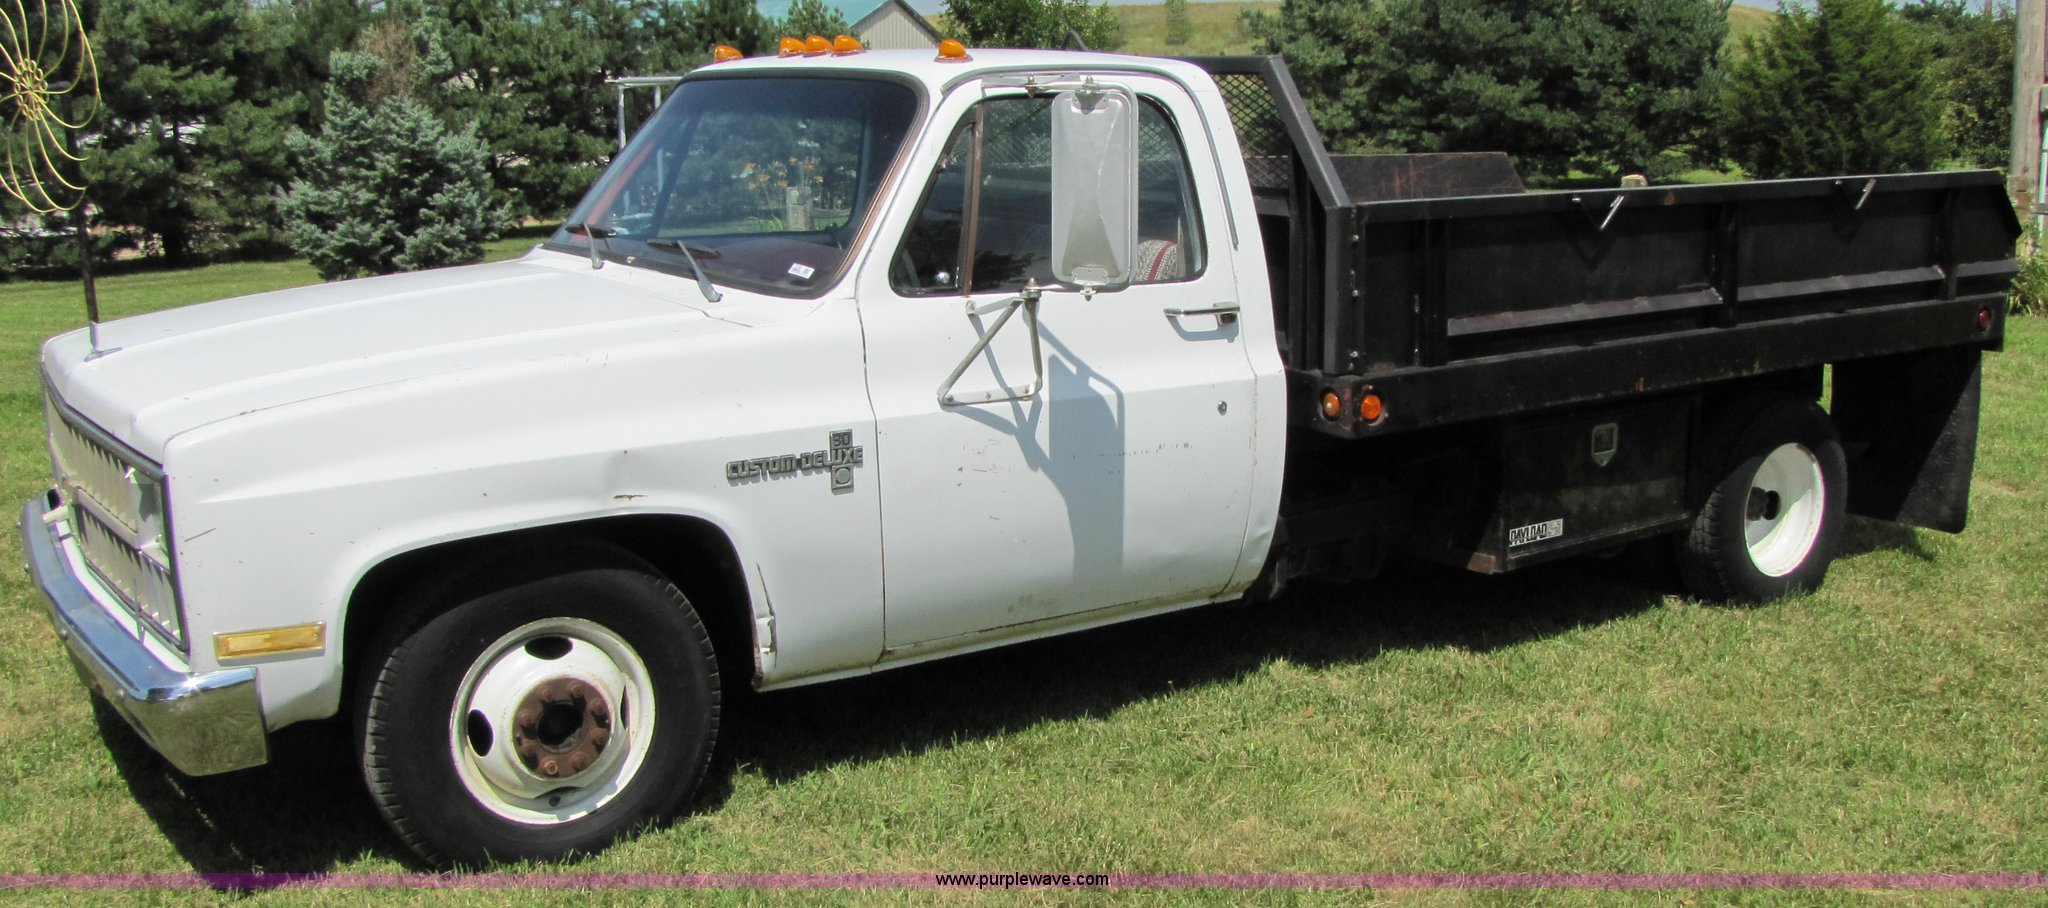 All Chevy c30 chevy : 1982 Chevrolet C30 Custom Deluxe dump bed truck | Item 7238 ...